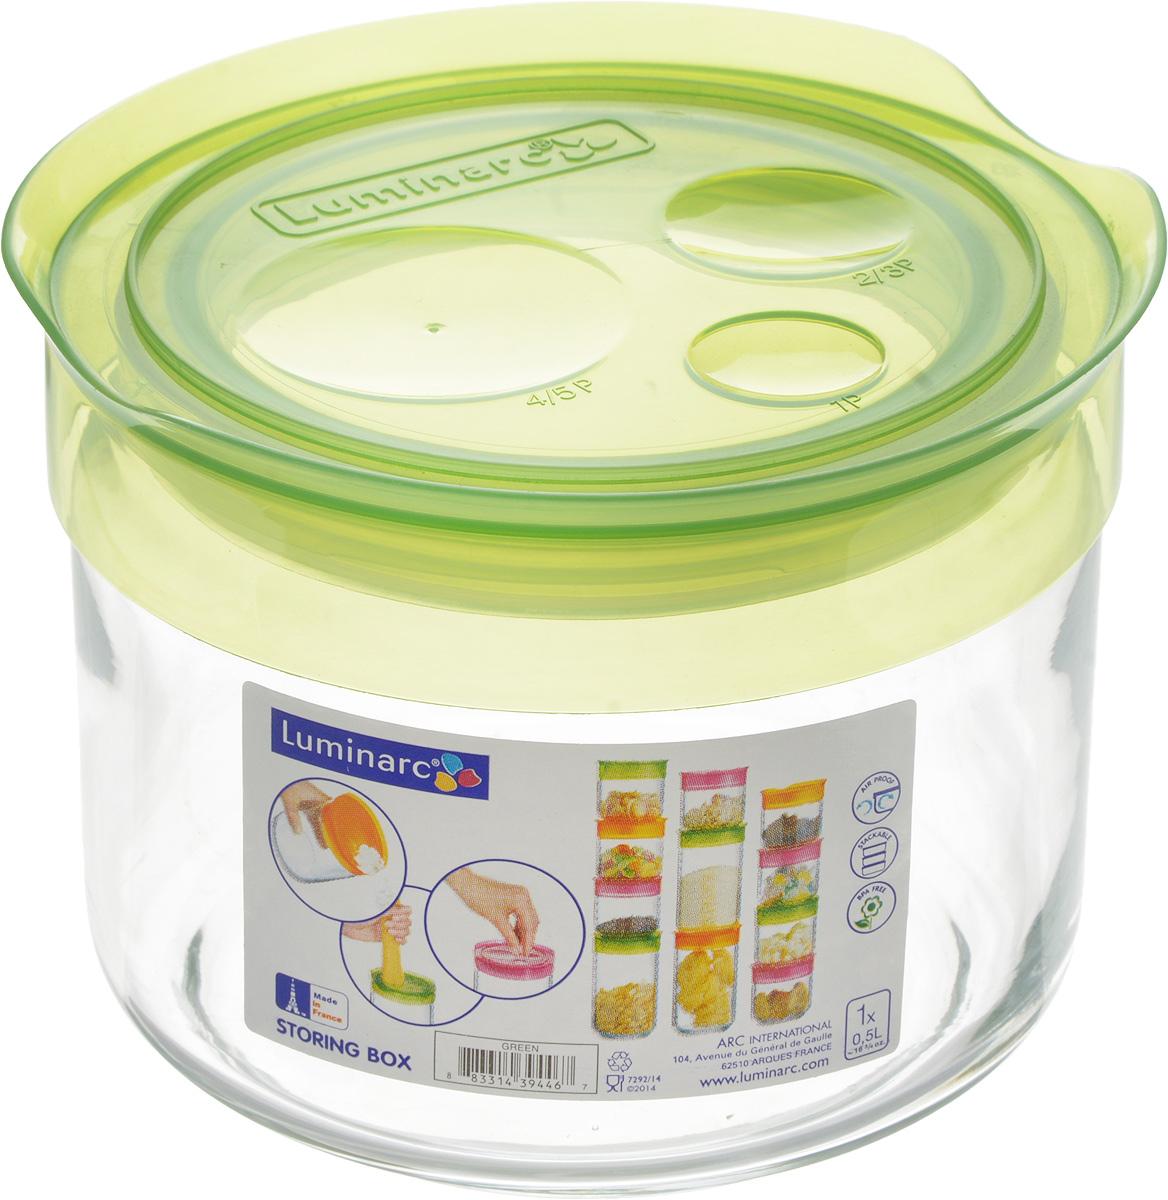 Банка для сыпучих продуктов Luminarc Storing Box, с крышкой, цвет: салатовый, 500 мл банка 11х7 5х12 5 см 500 мл nouvelle банка 11х7 5х12 5 см 500 мл